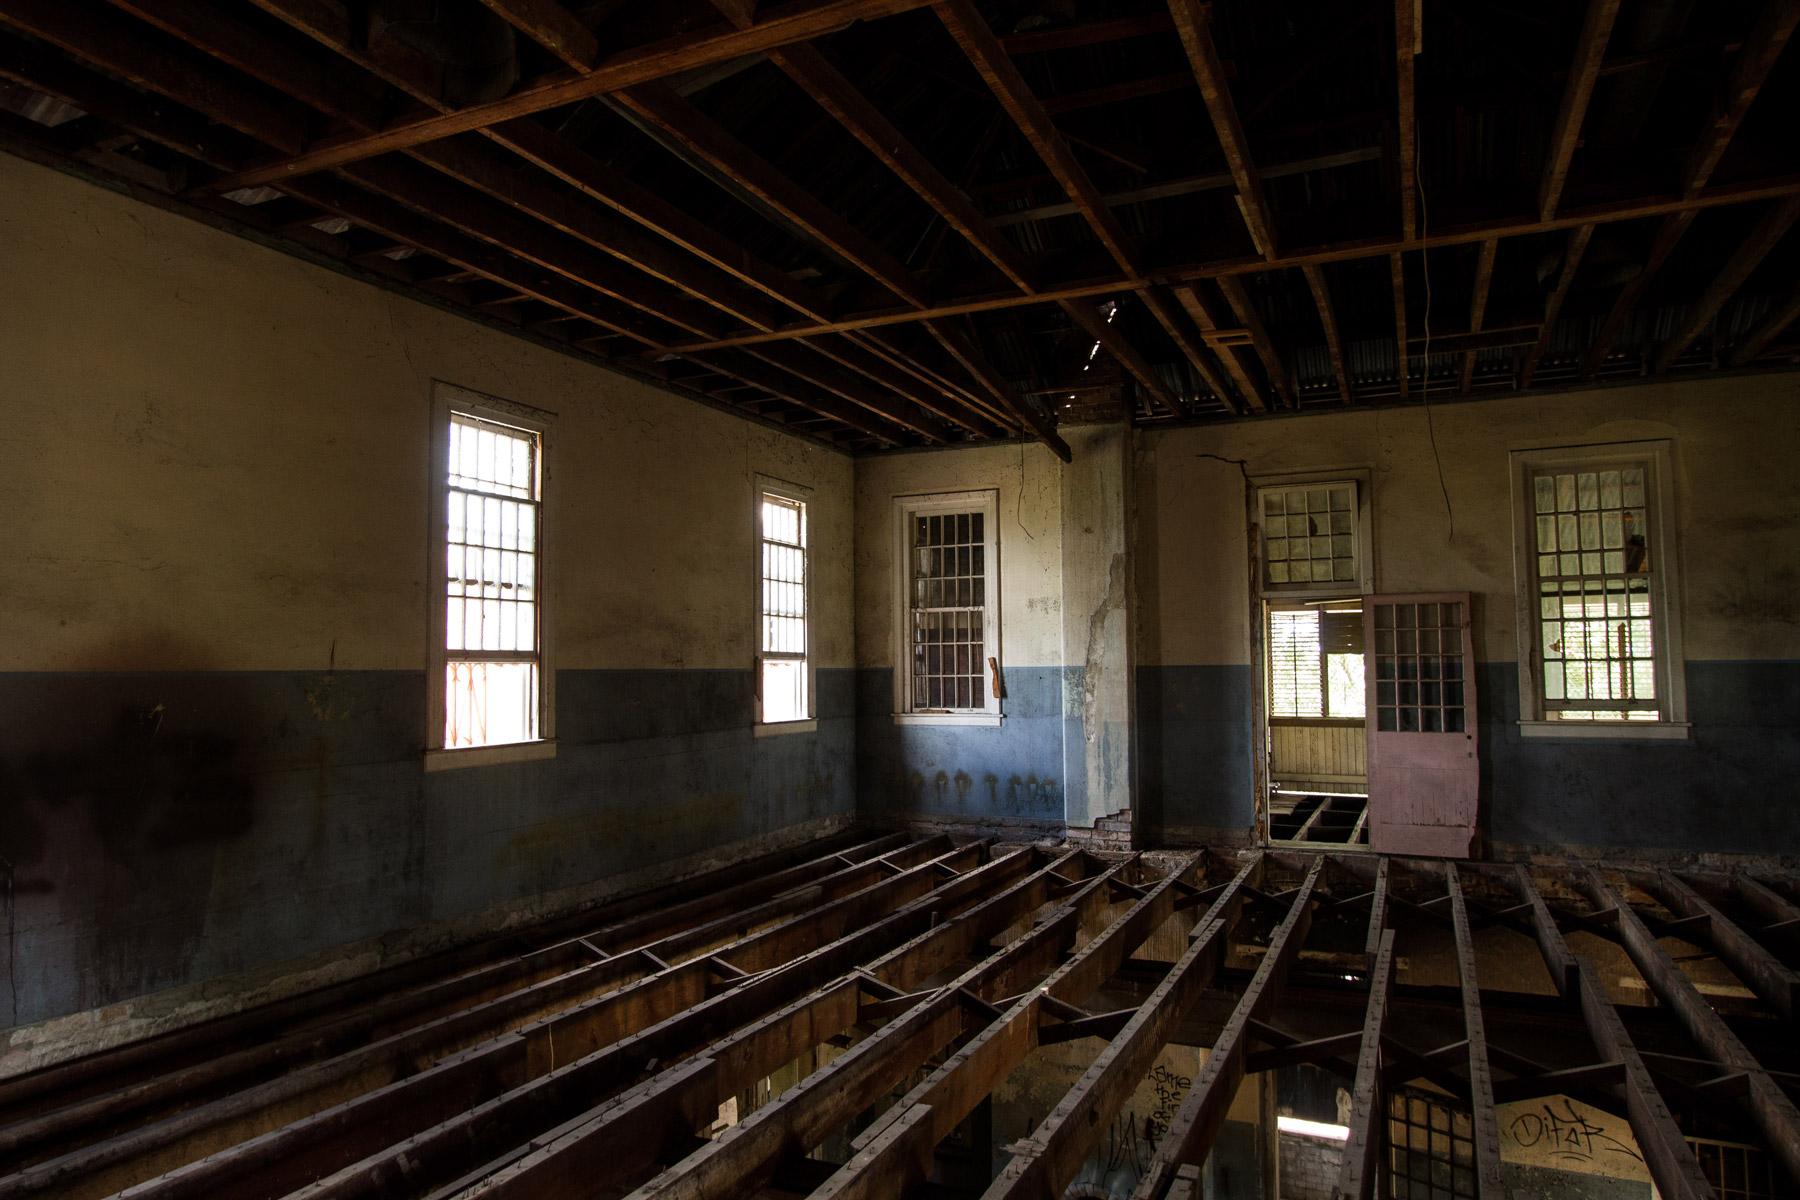 A room inside the abandoned Woogaroo Lunatic Asylum in Brisbane